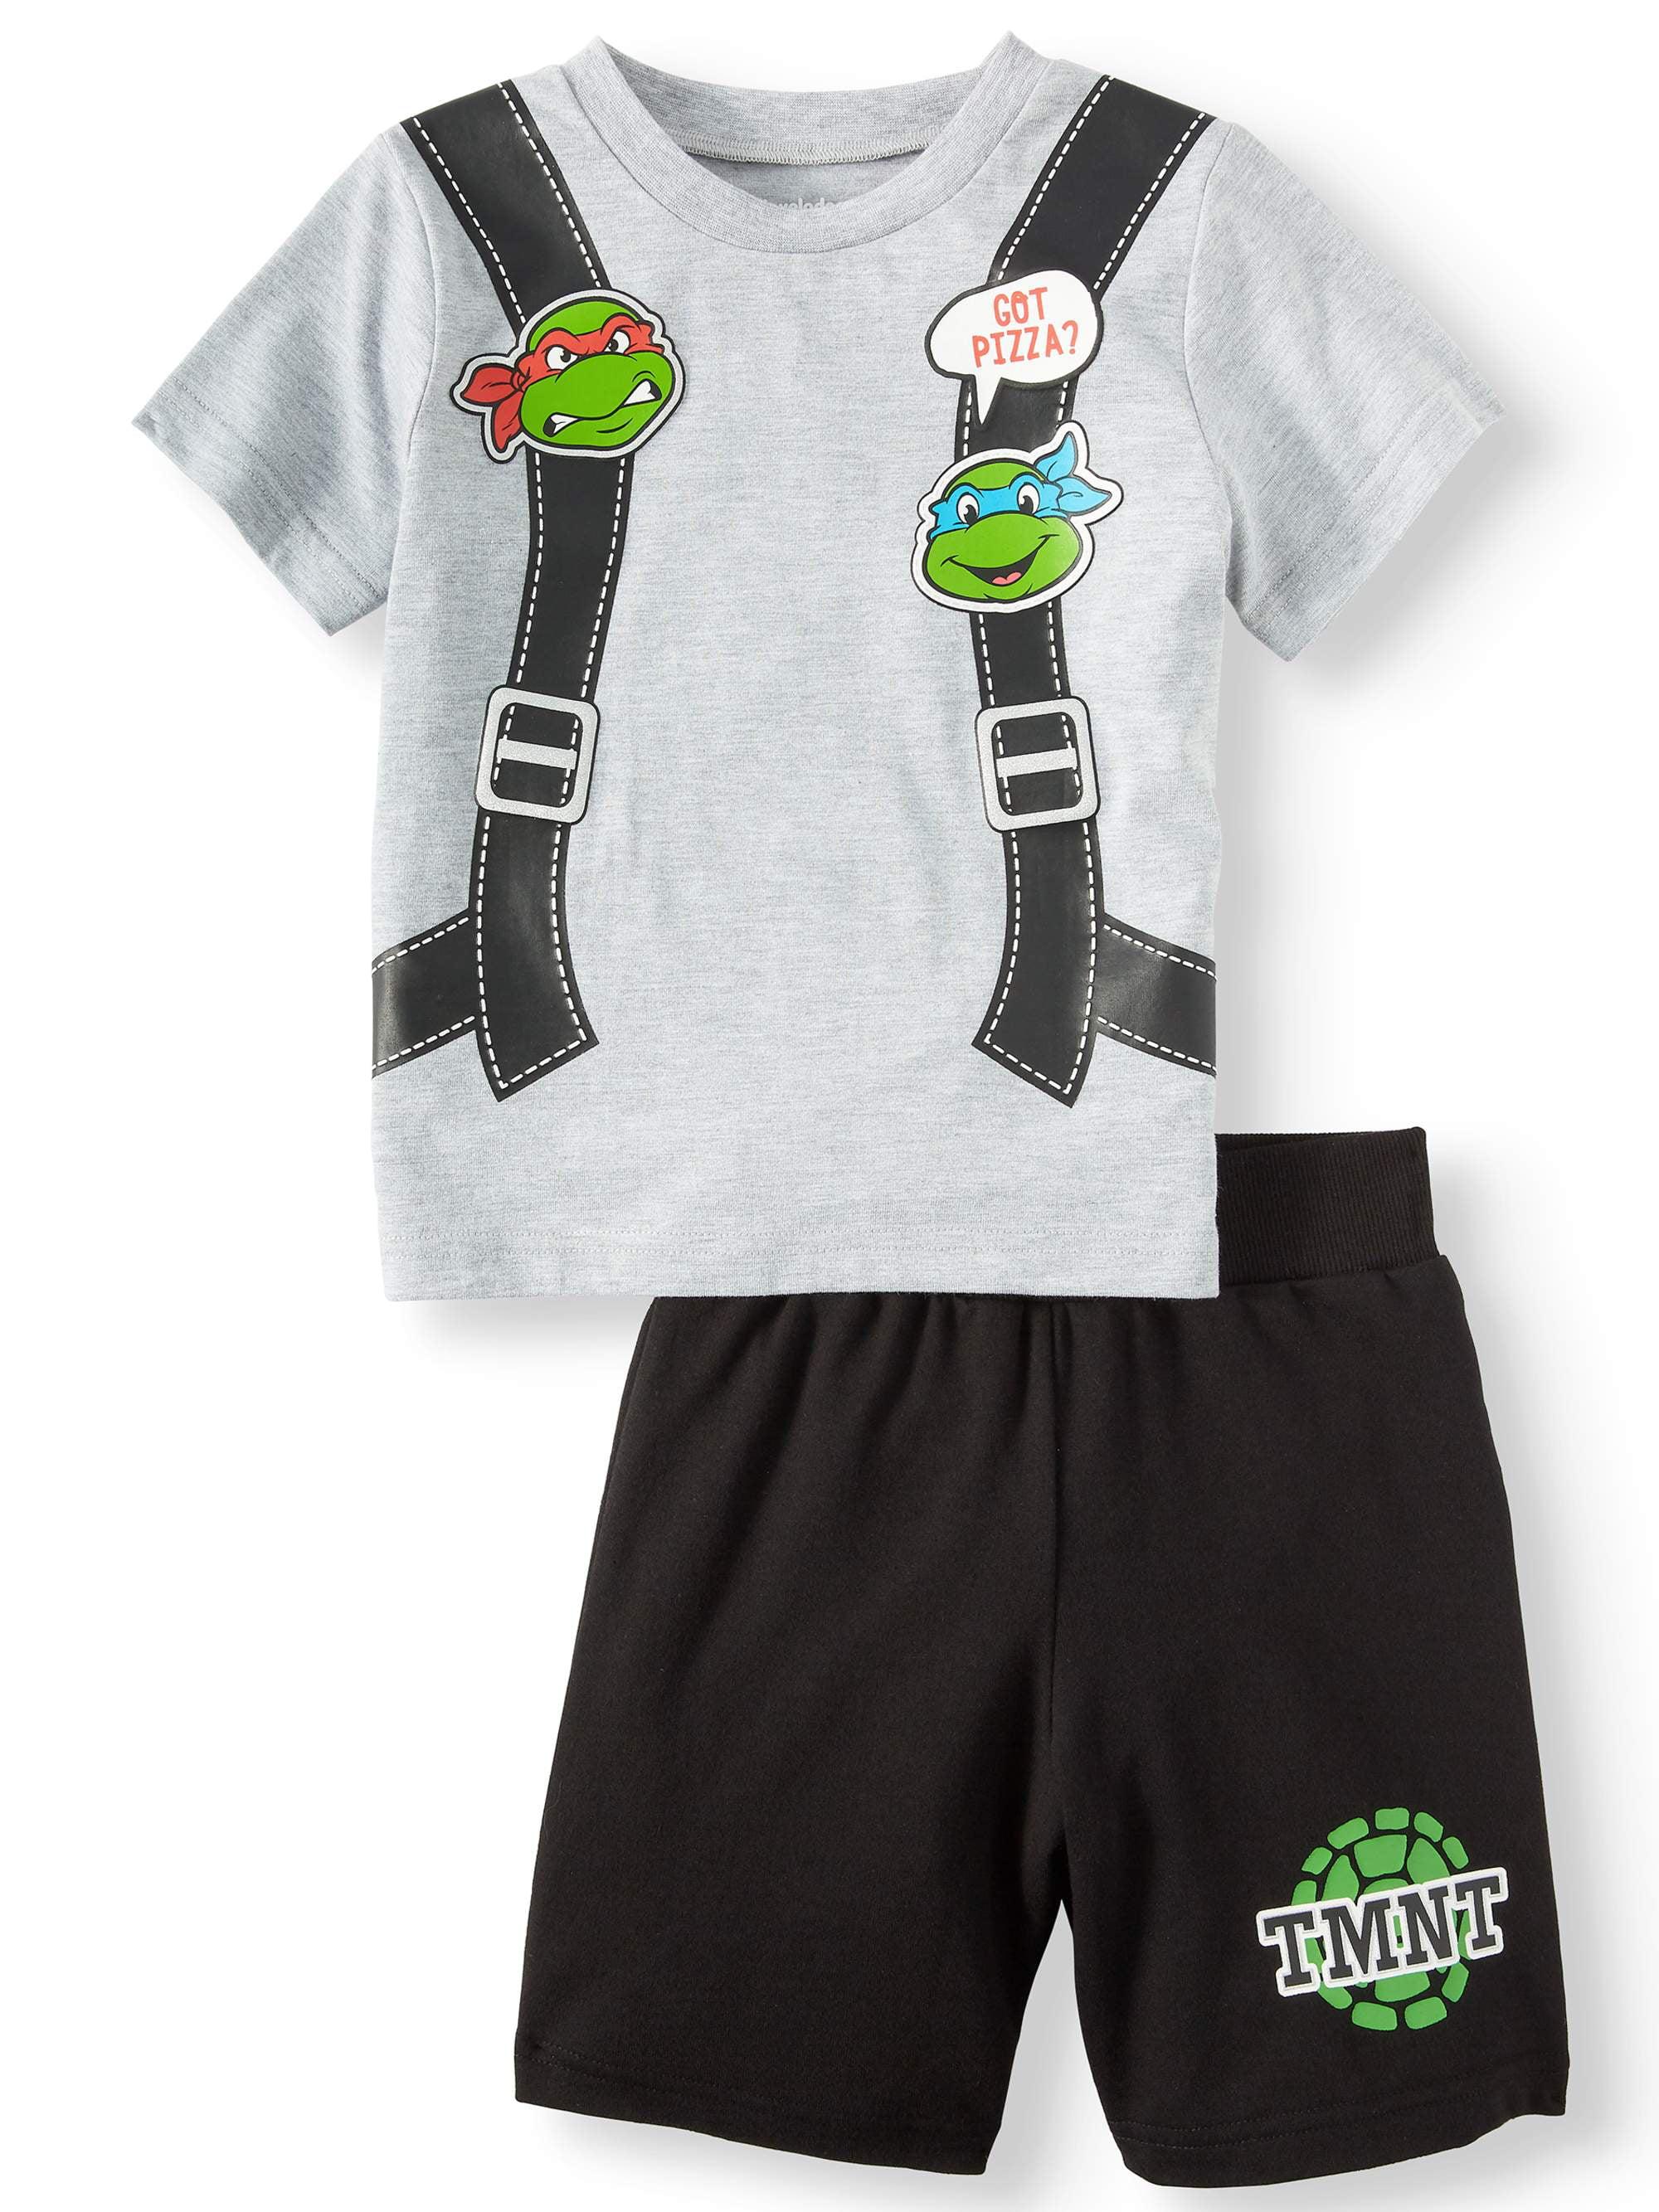 T-Shirt & Shorts, 2pc Outfit Set (Toddler Boys)